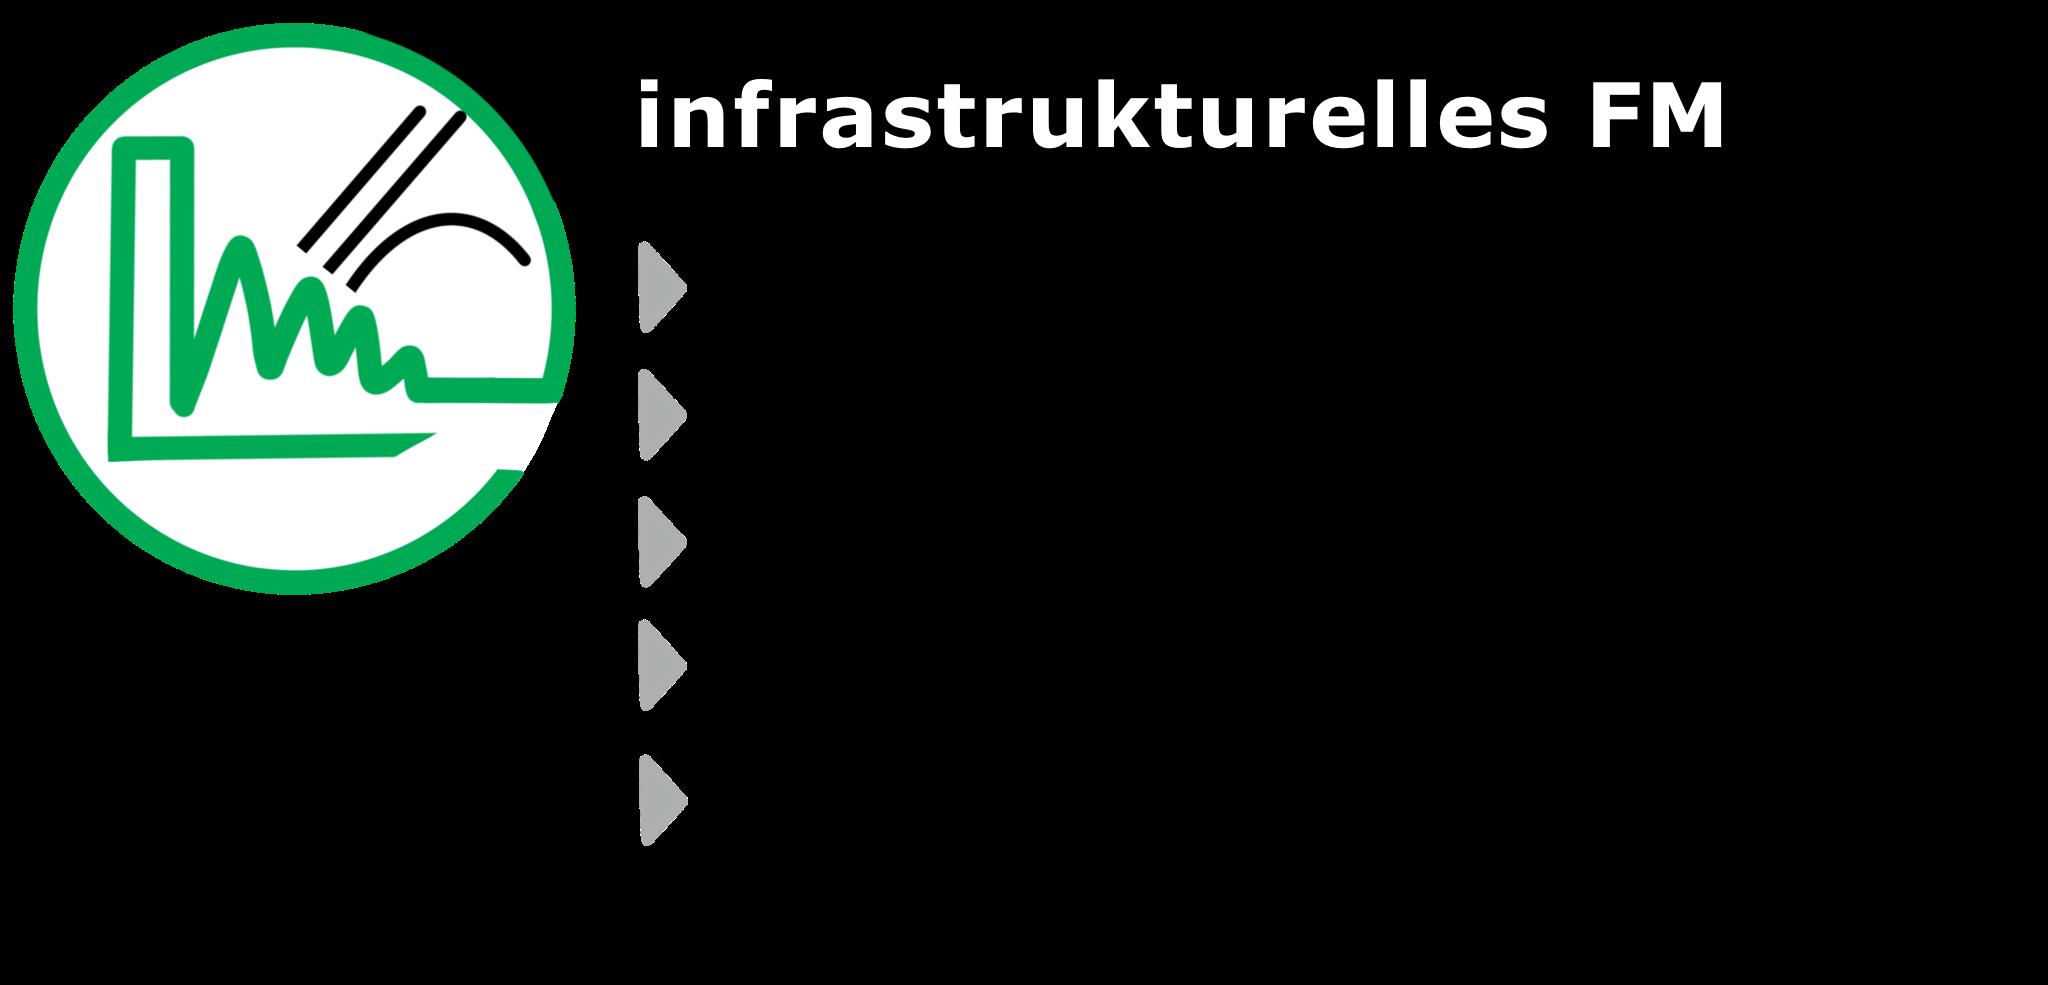 infrastrukturellesFM